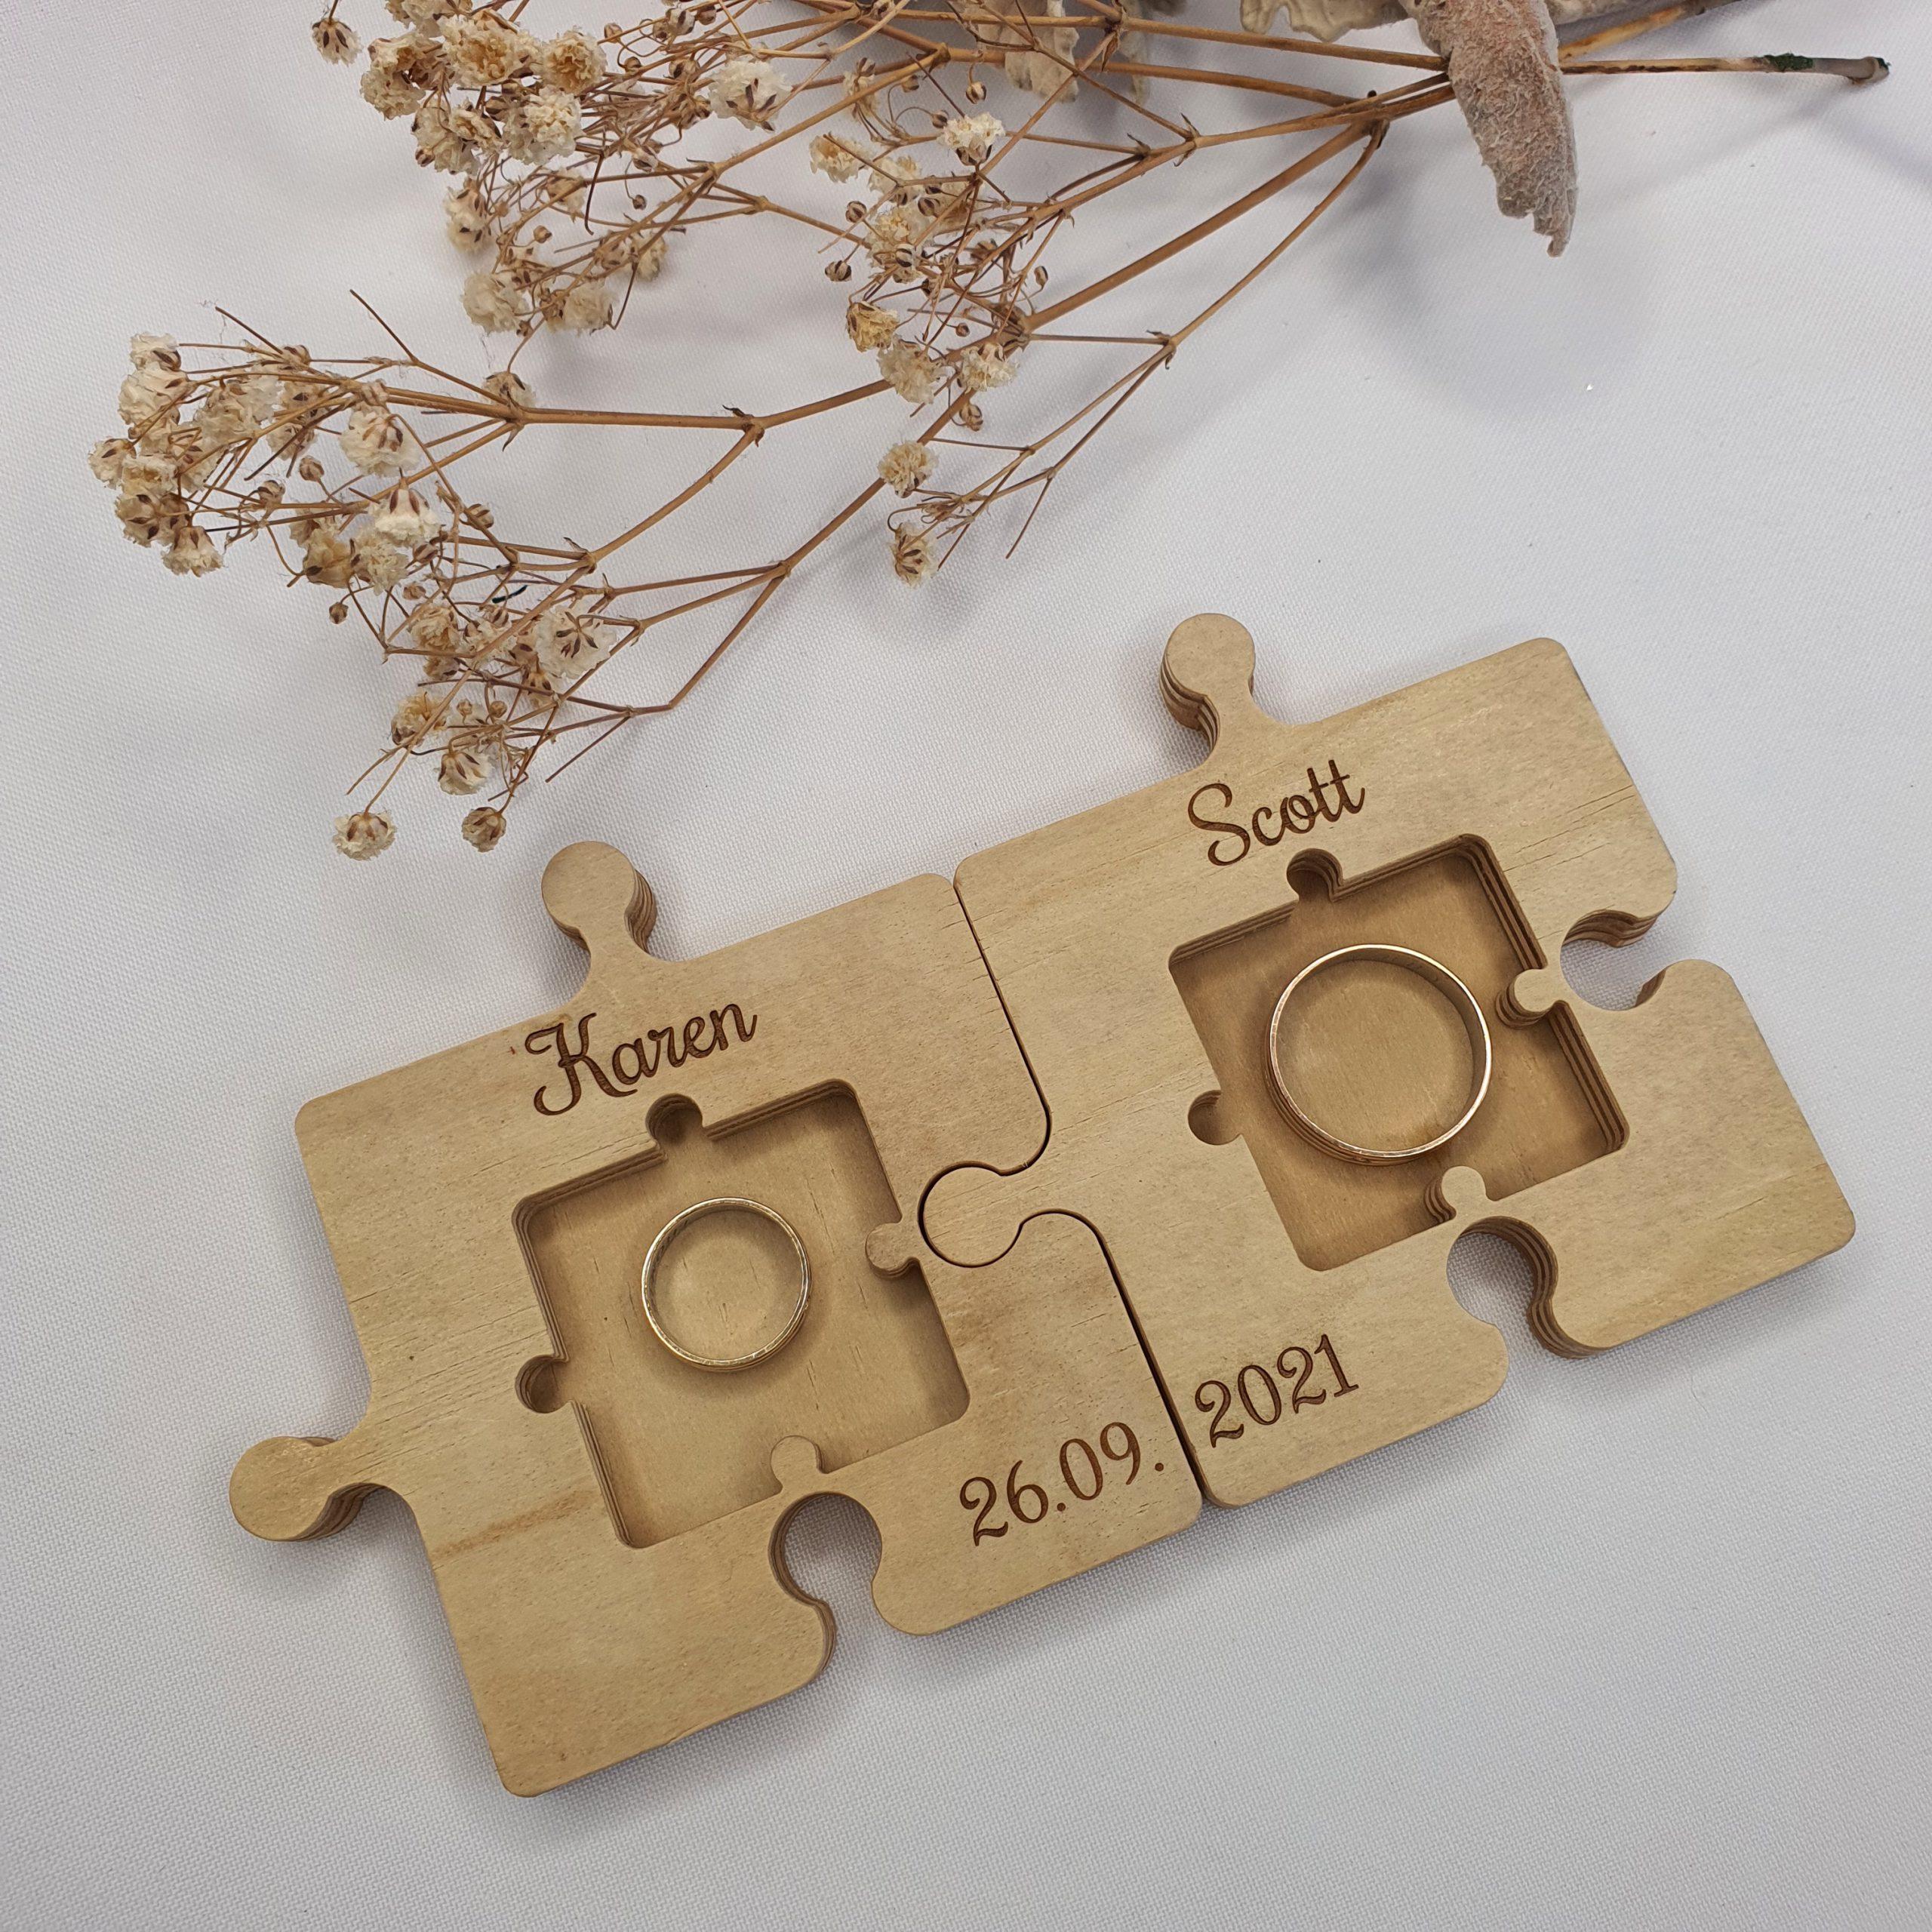 Personalised Wooden Wedding Ring Bearer Pillow